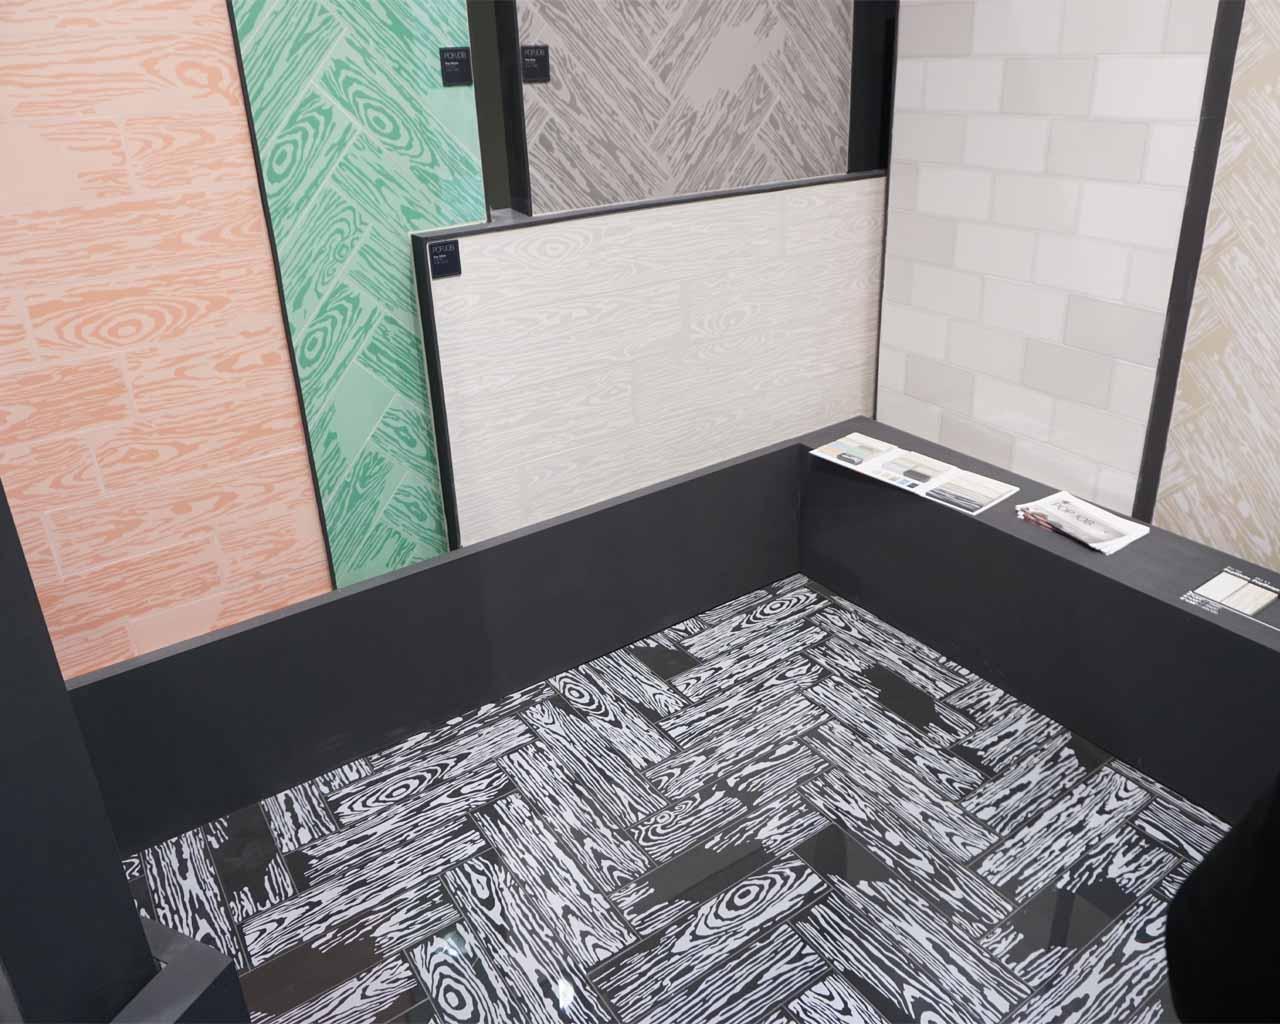 Holzoptik in Art Deco Farben - made for Miami